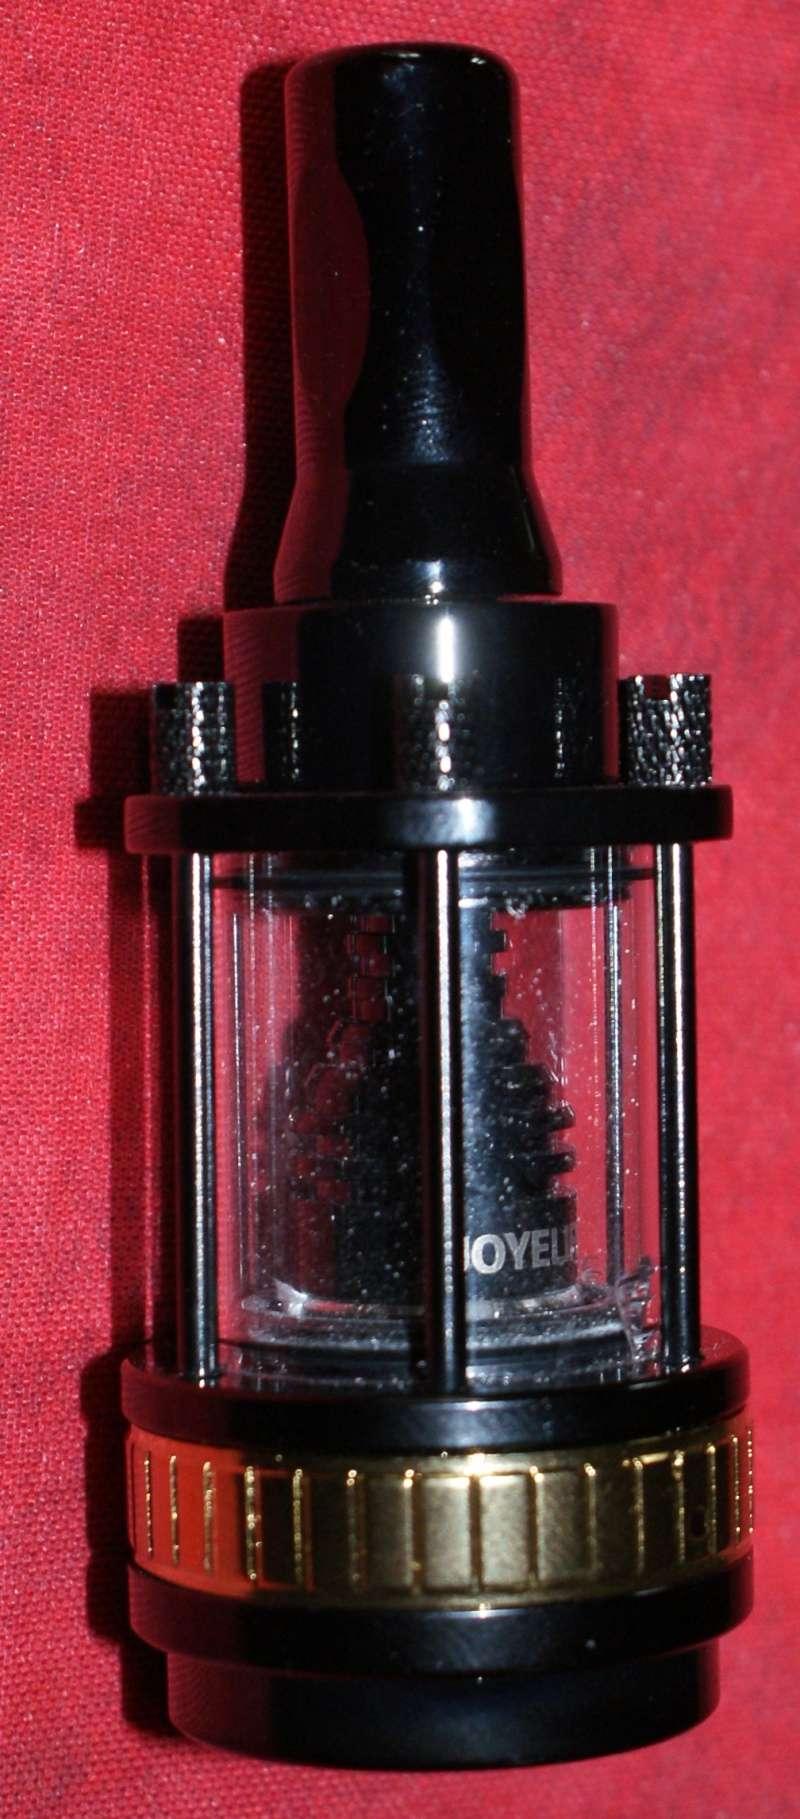 Mod méca joyelife energy column 26650 Dsc01710